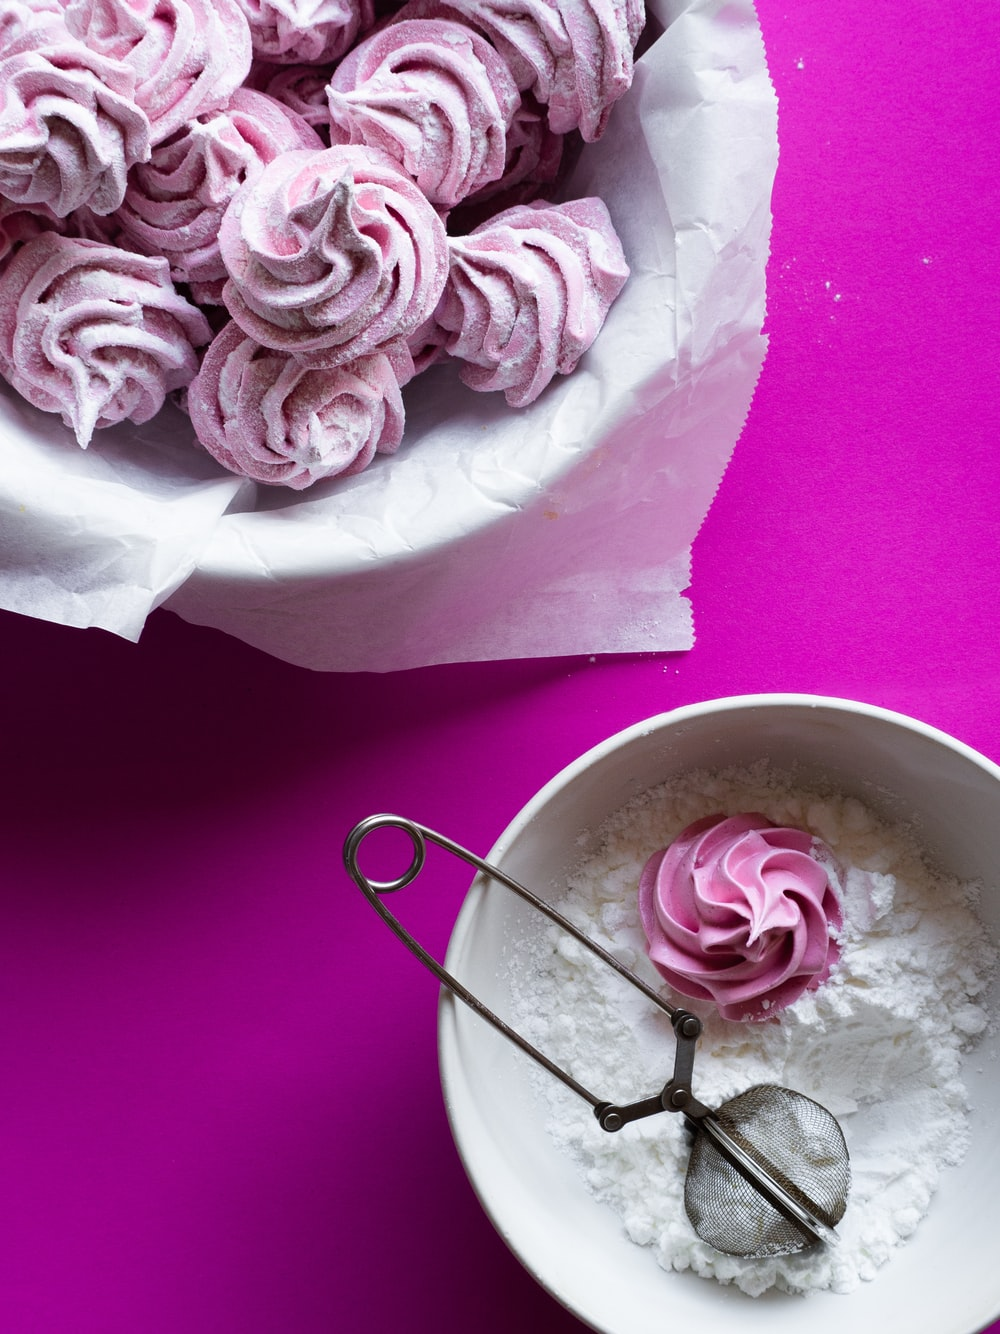 pink rose bouquet on white ceramic bowl